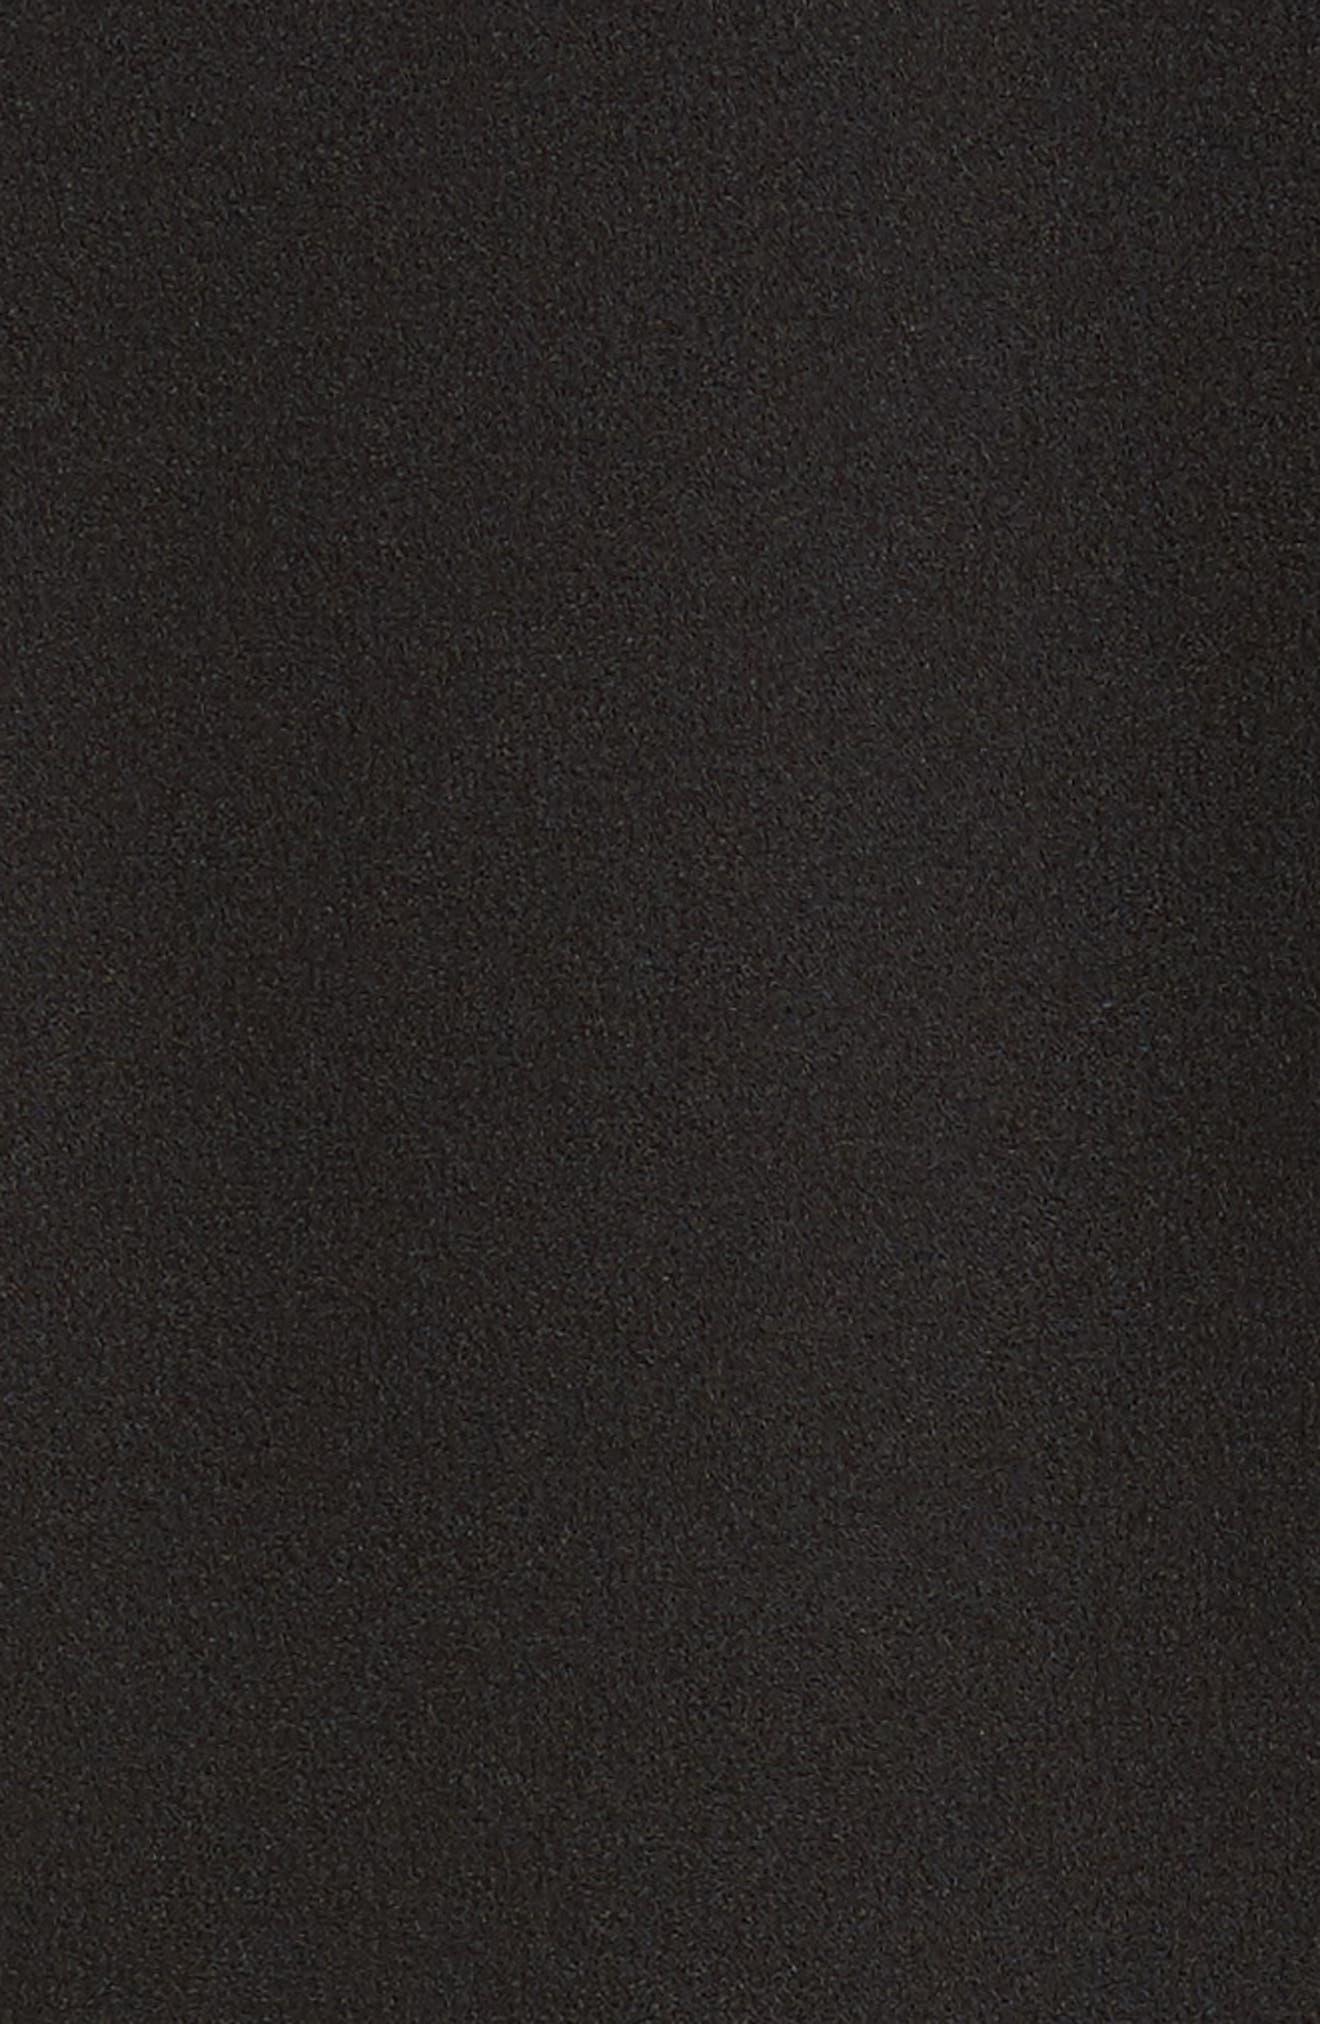 Kilkenny Frill Sleeve Minidress,                             Alternate thumbnail 6, color,                             Black